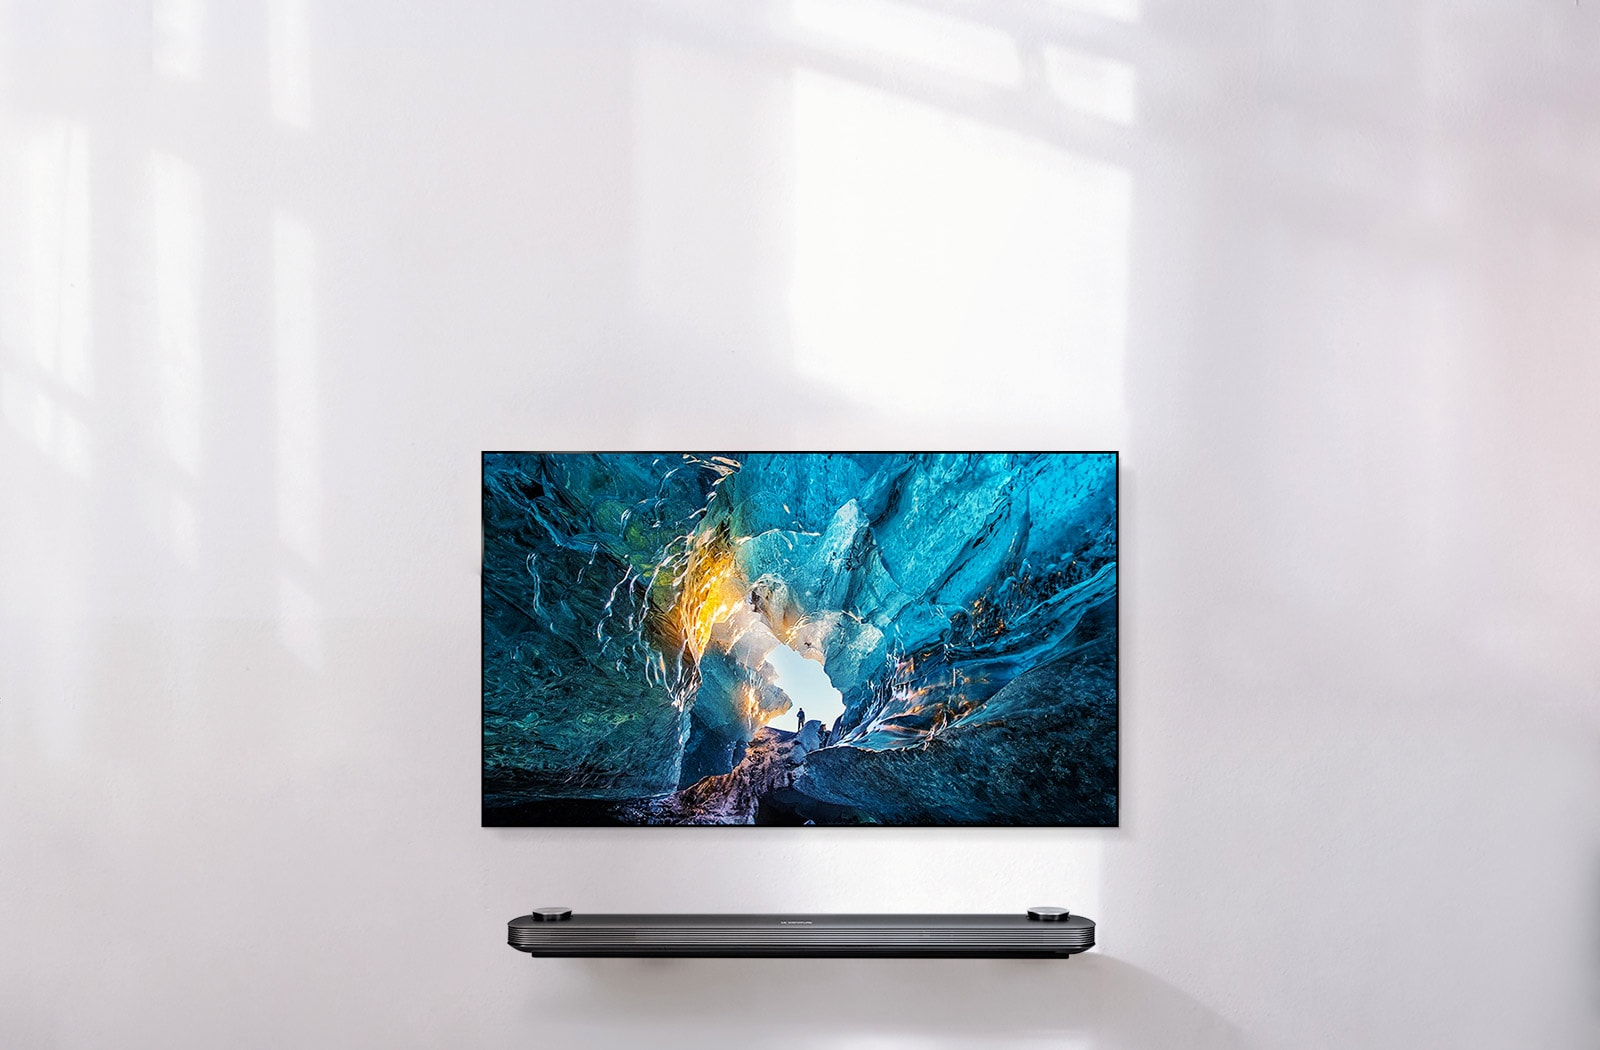 LG OLED TV รองรับ HDR ทั้งแบบ Dolby Visionm HDR 10 และ Hybrid Log Gamma